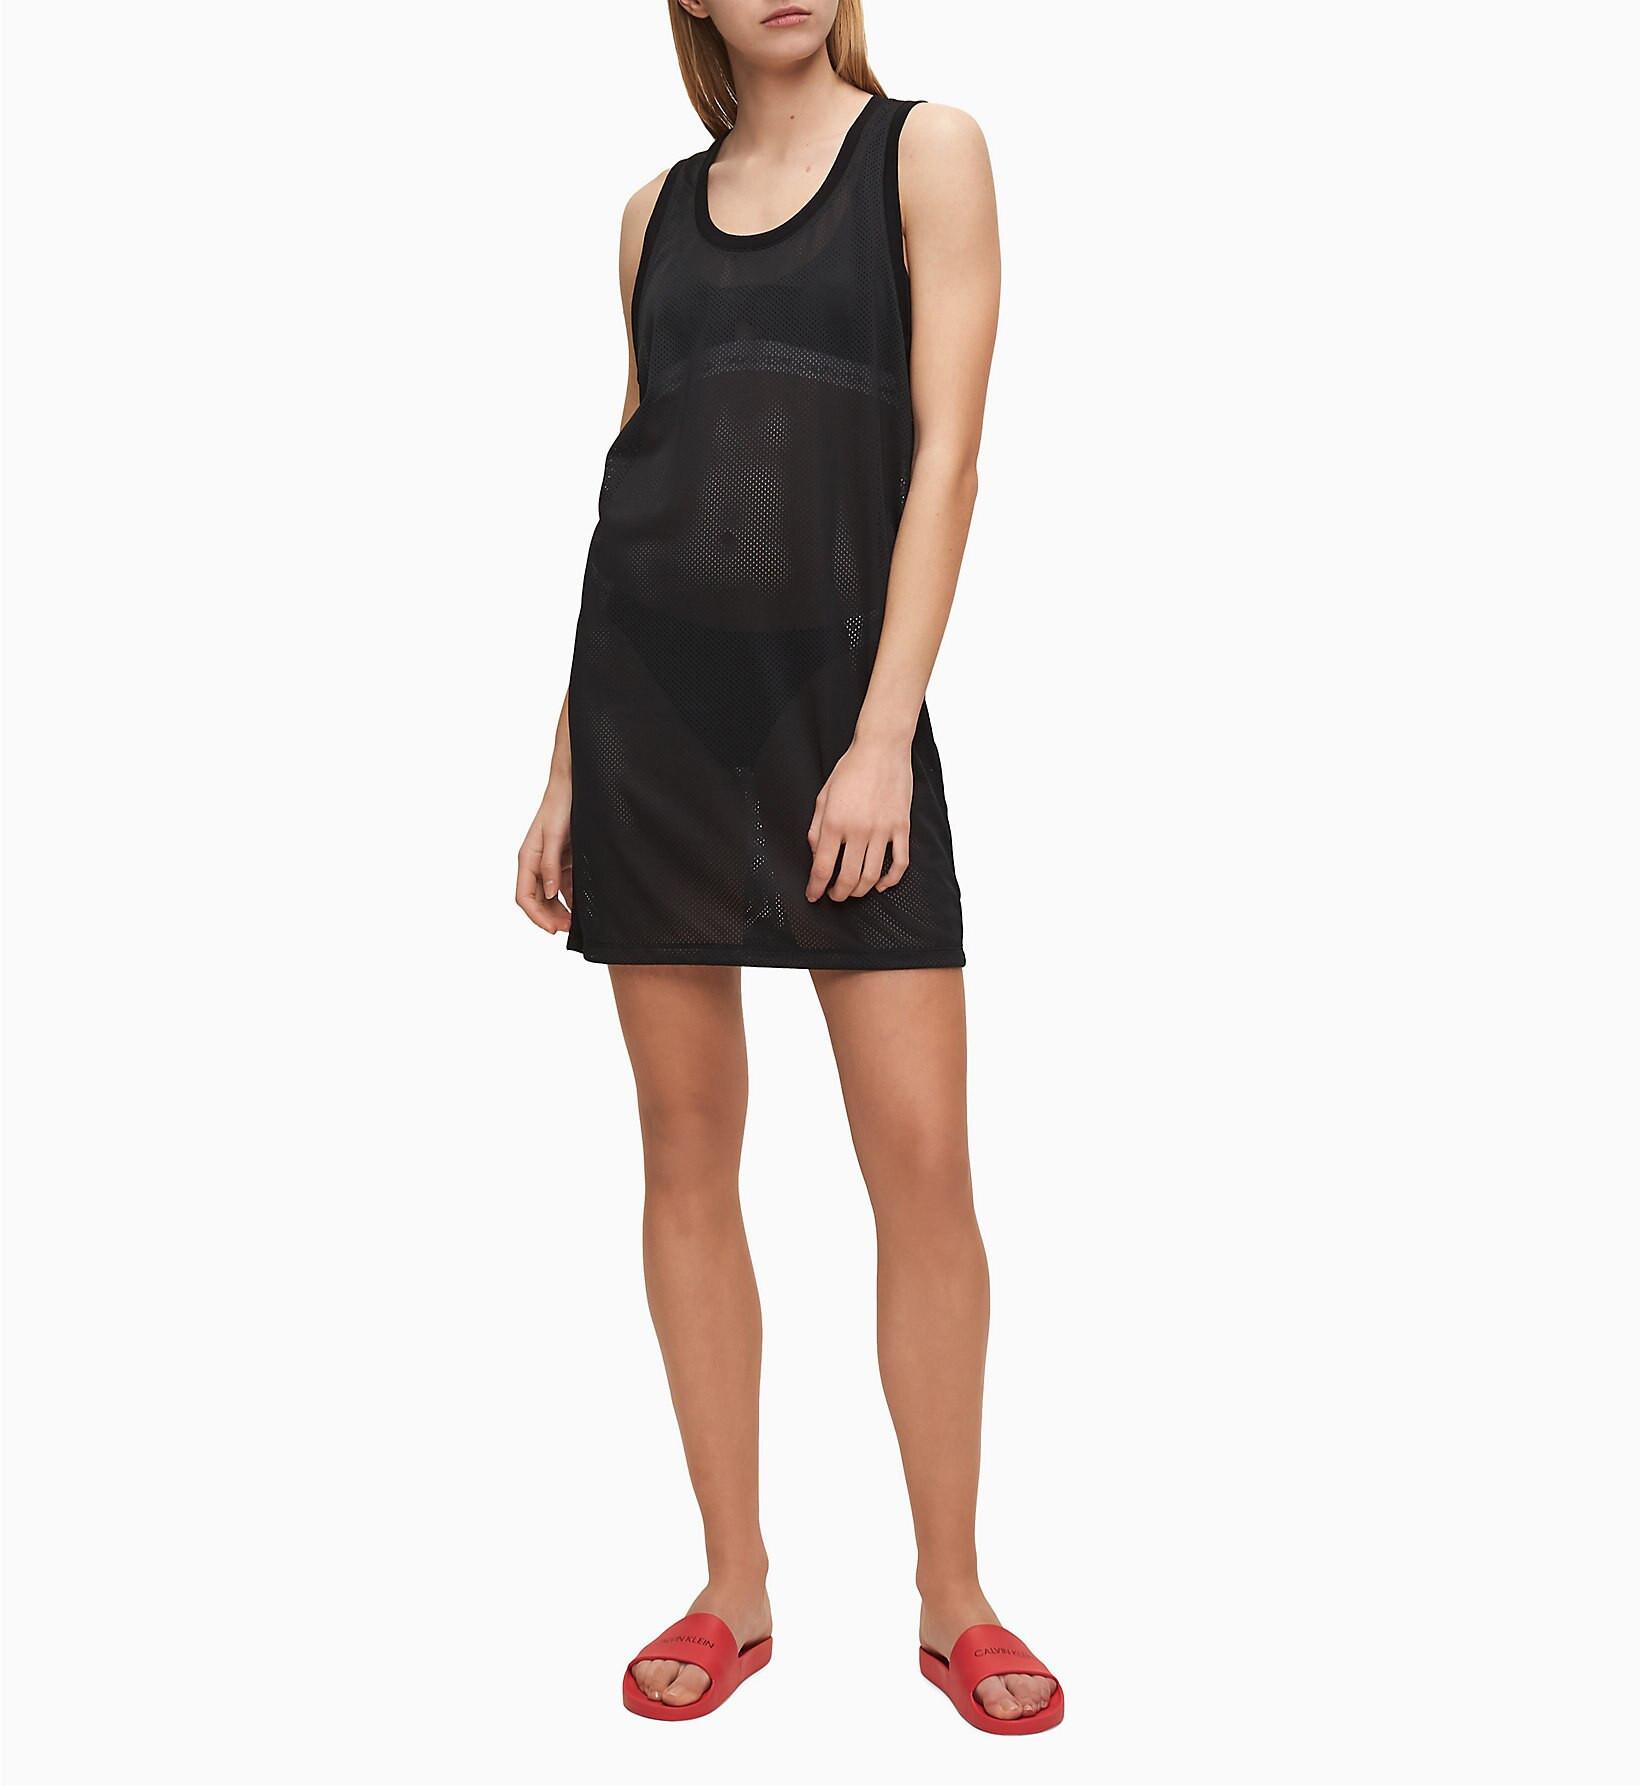 Plážové šaty KW0KW01001-BEH čierna - Calvin Klein čierna L